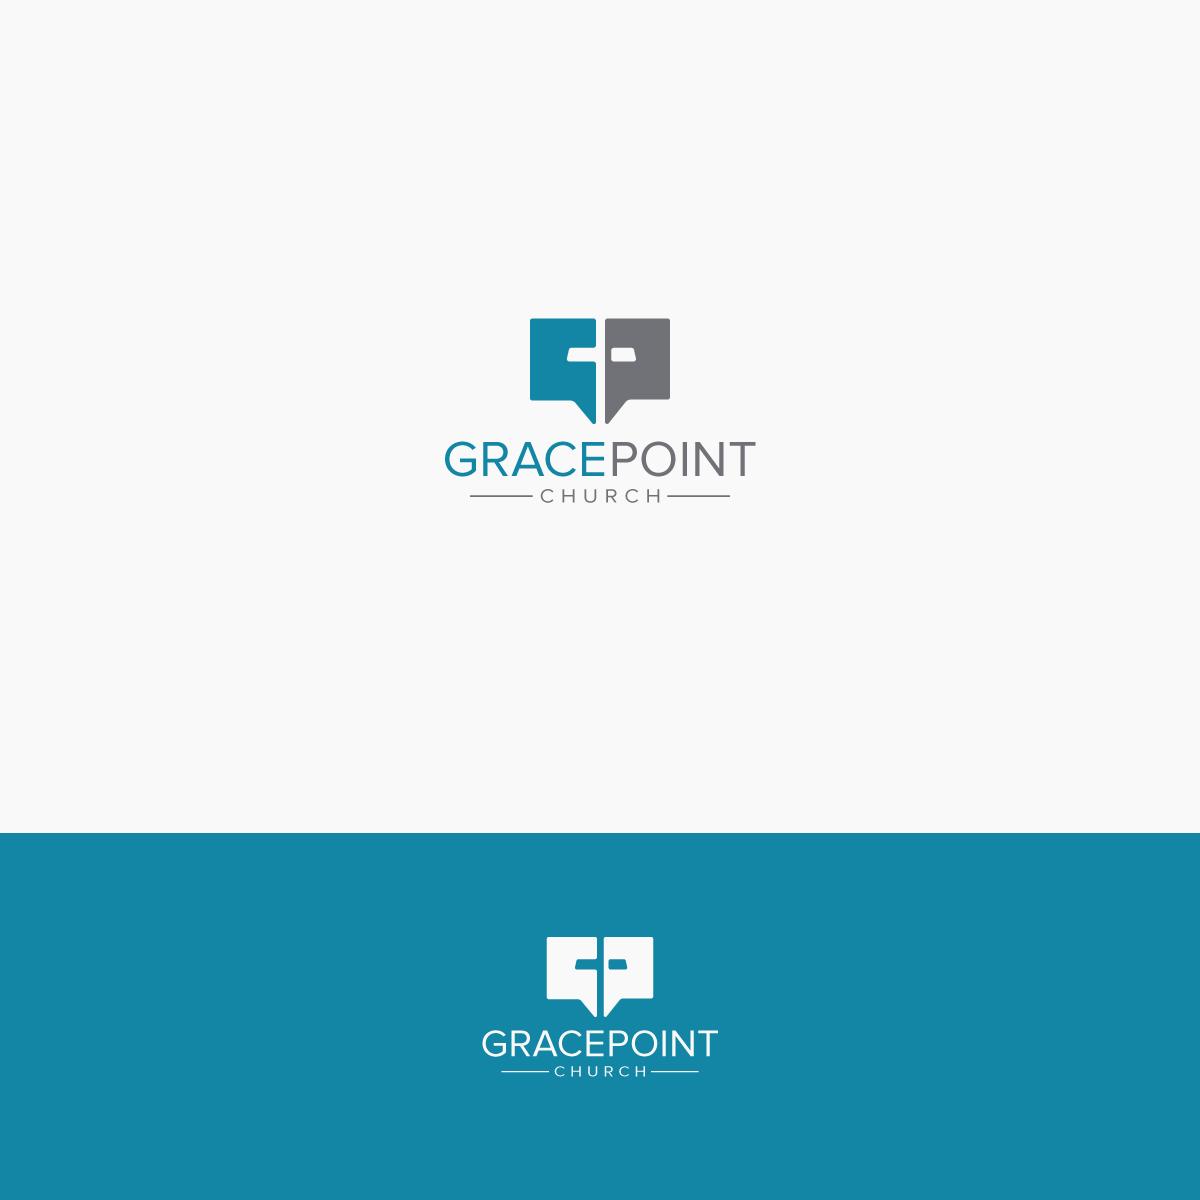 GracePoint Church logo design.